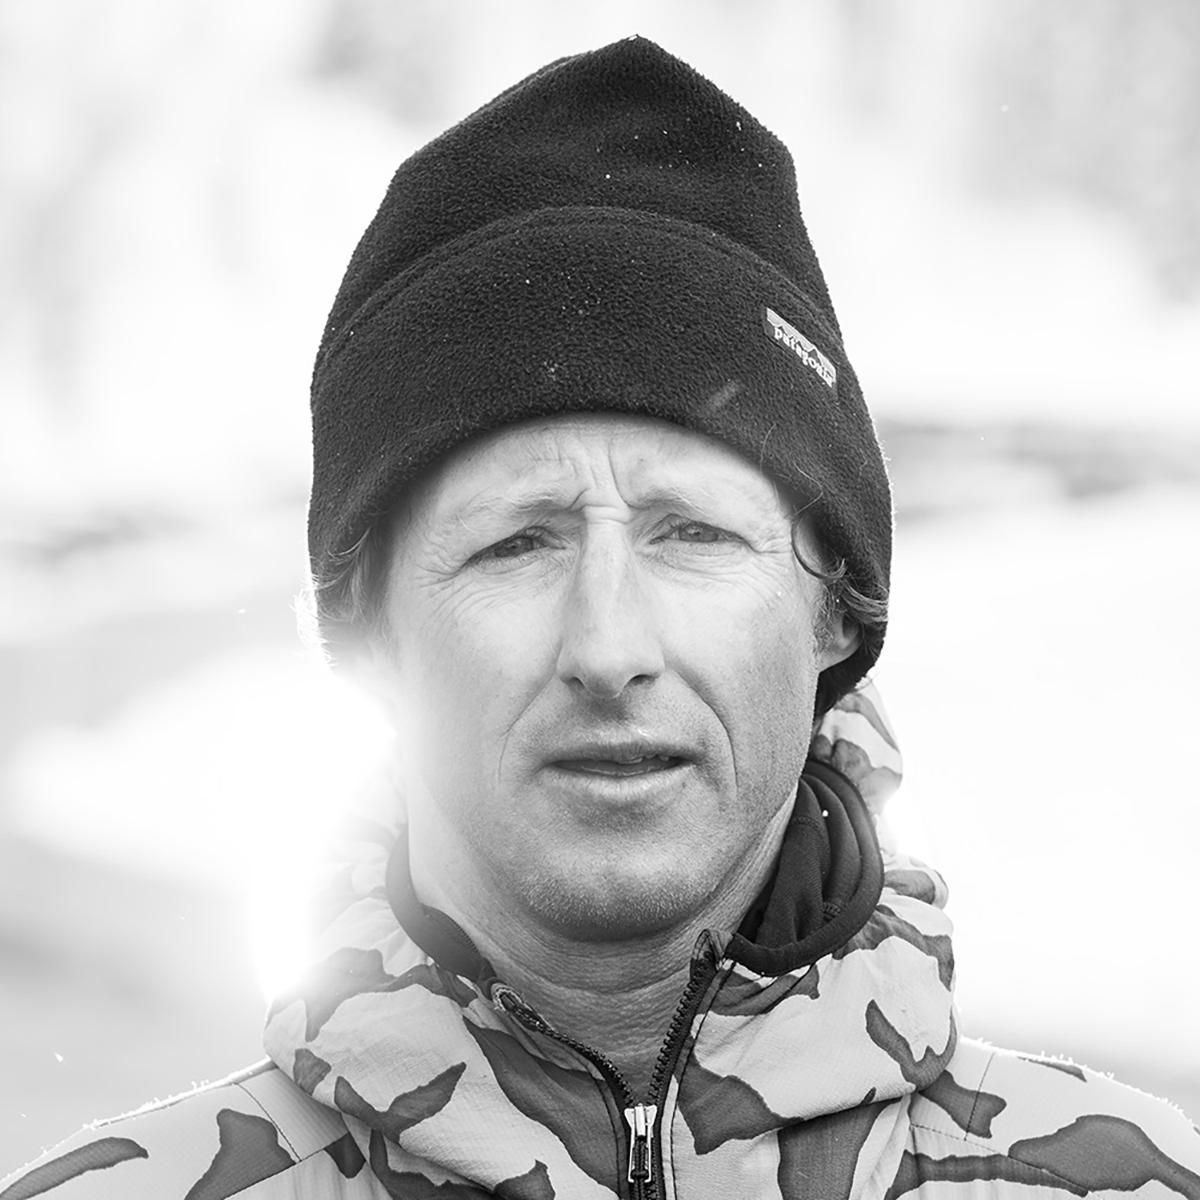 union rider Forrest Shearer